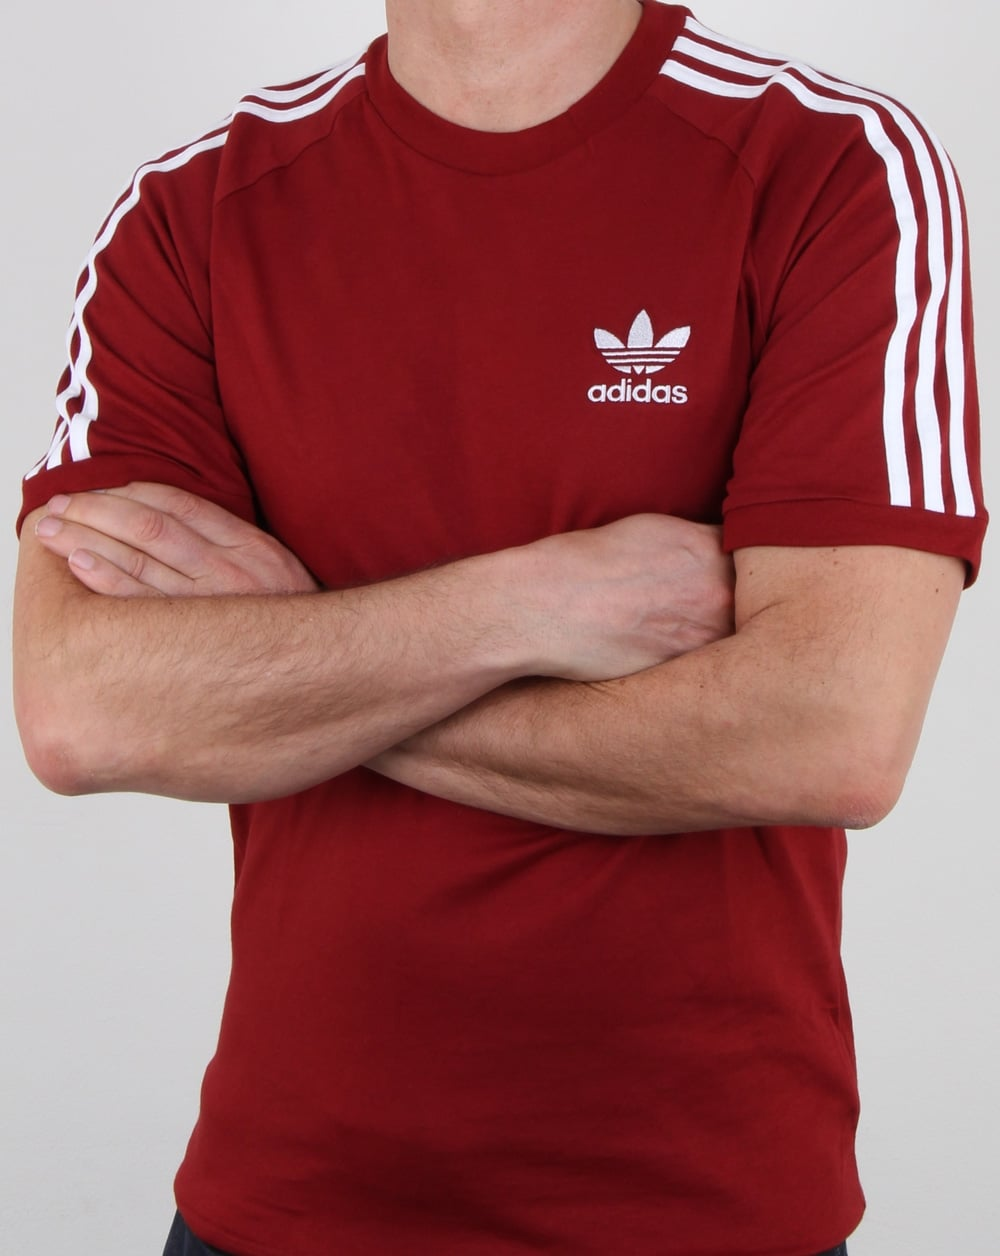 Adidas Originals 3 Stripes T Shirt Rust Red